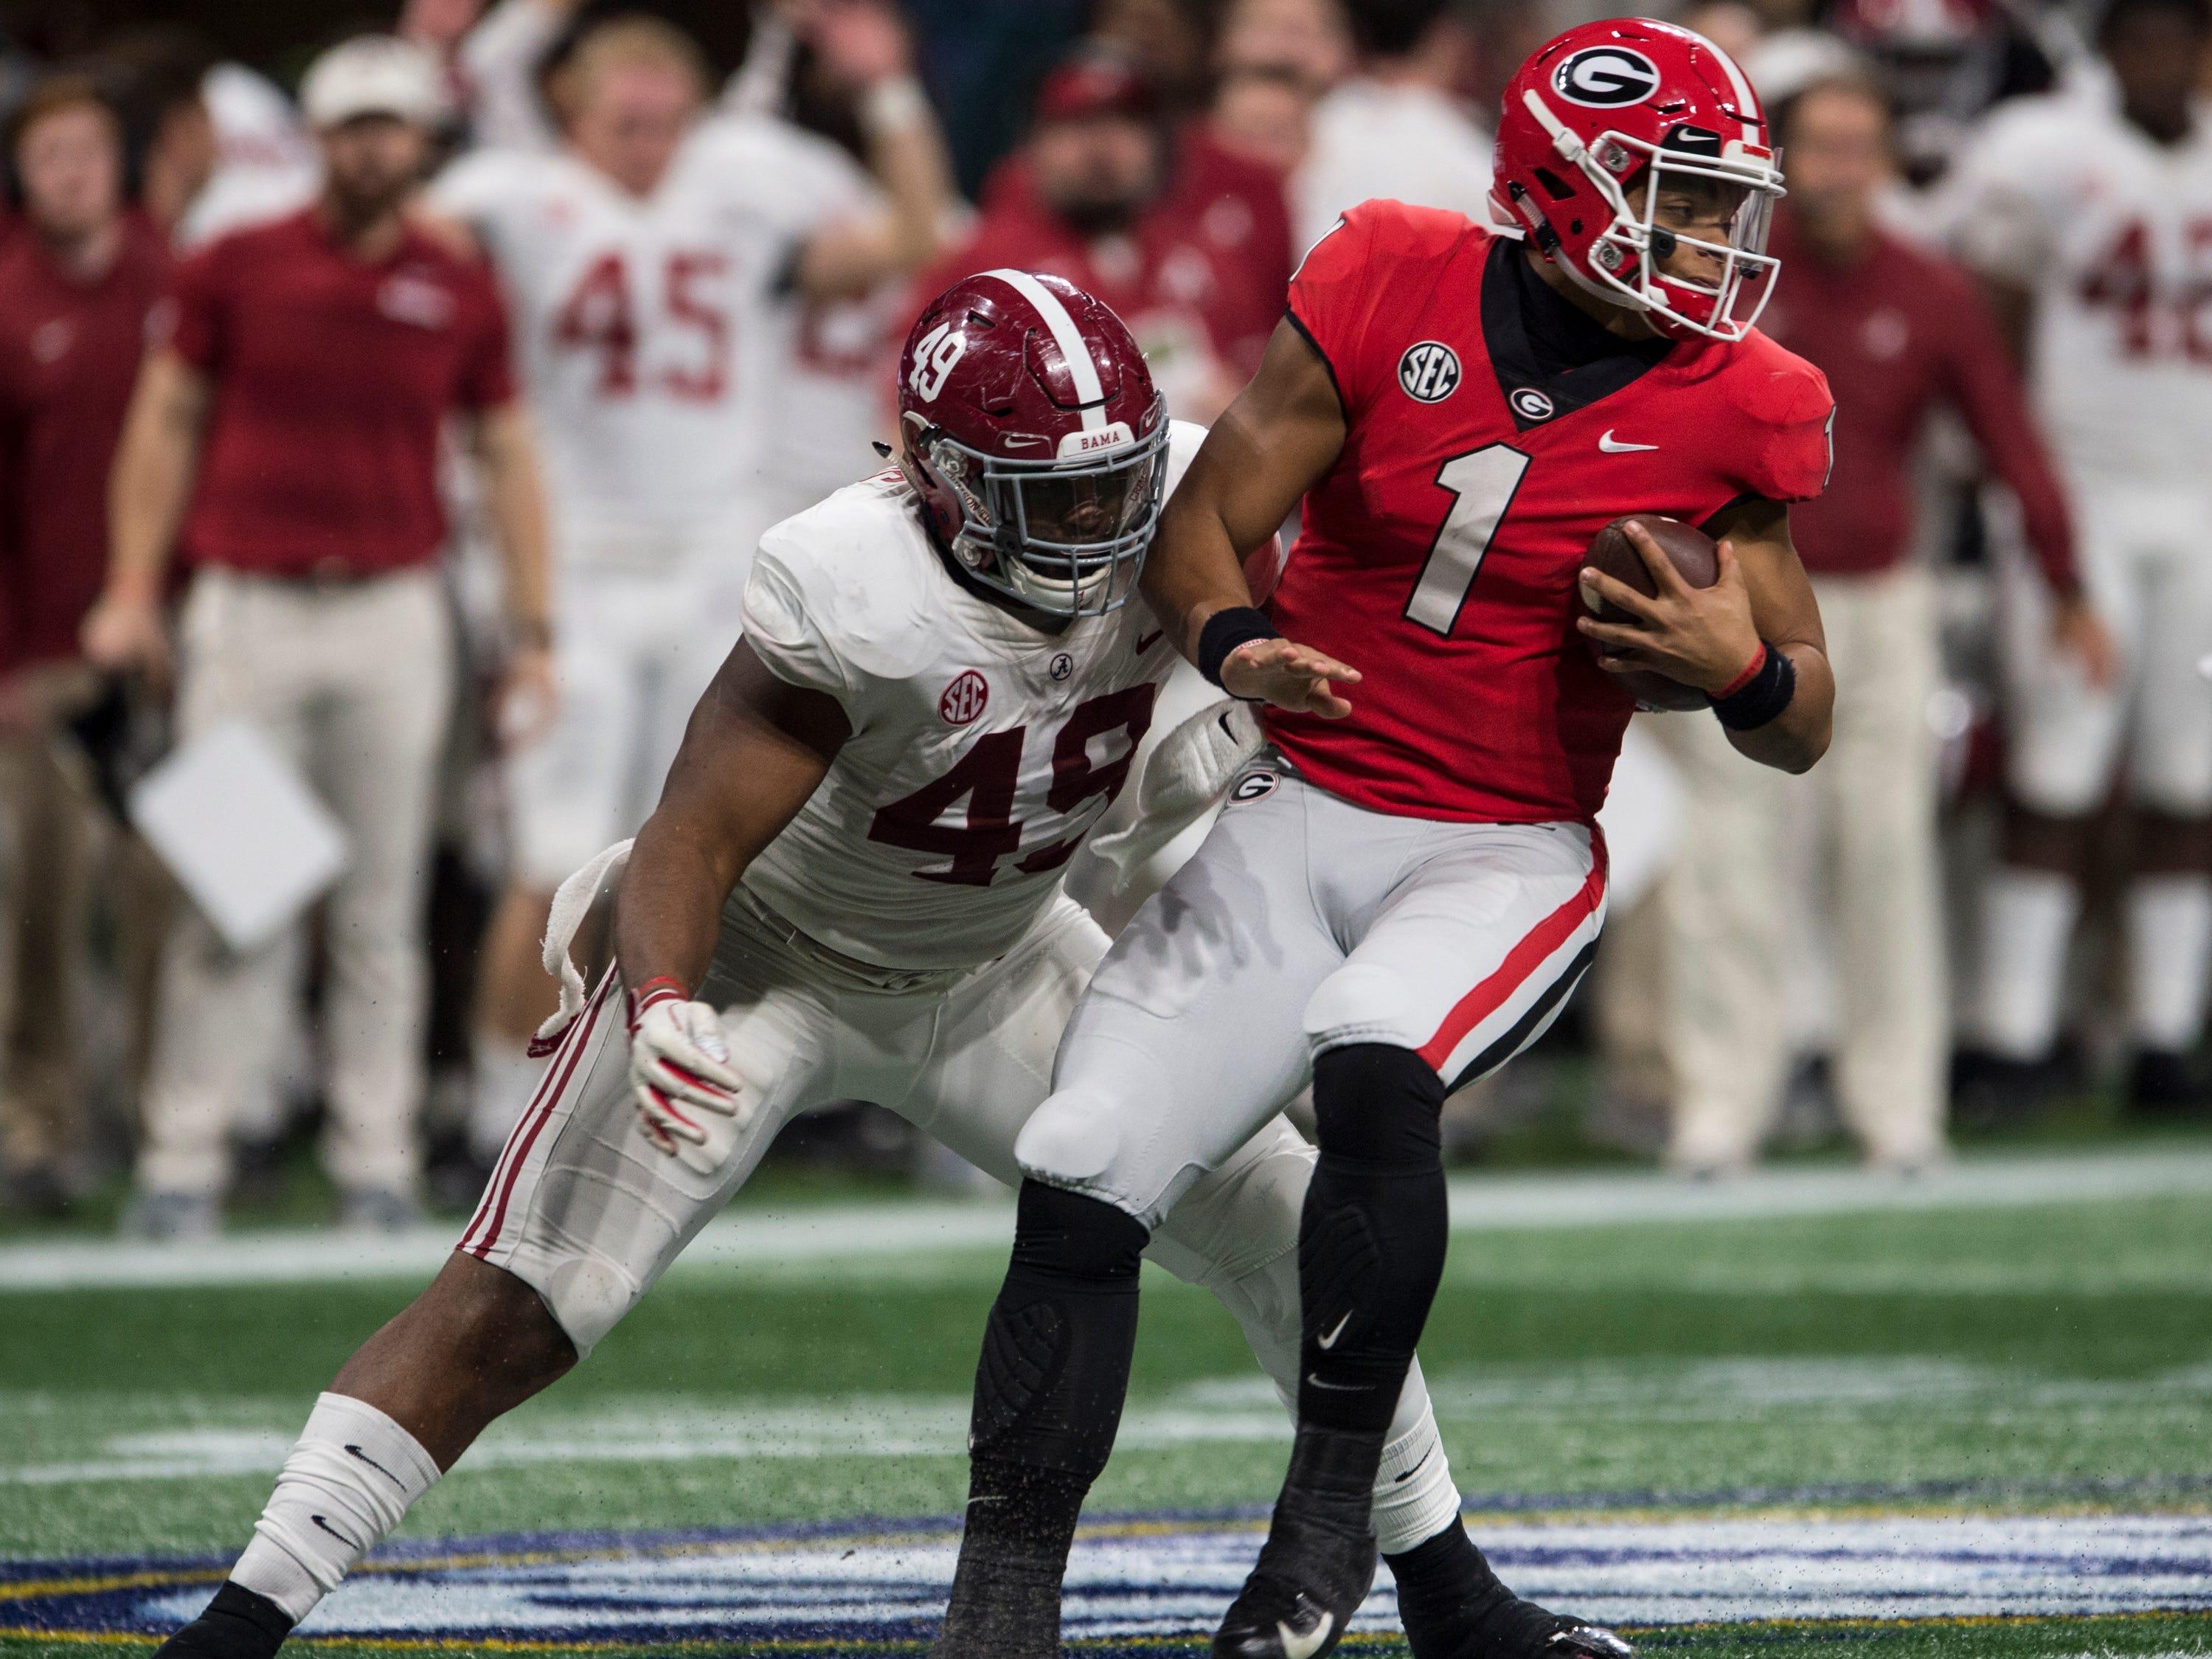 Georgia quarterback Justin Fields (1) is taken down by Alabama defensive lineman Isaiah Buggs (49) during the SEC Championship game at Mercedes-Benz Stadium in Atlanta, Ga., on Saturday Dec. 1, 2018. Alabama defeated Georgia 35-28.